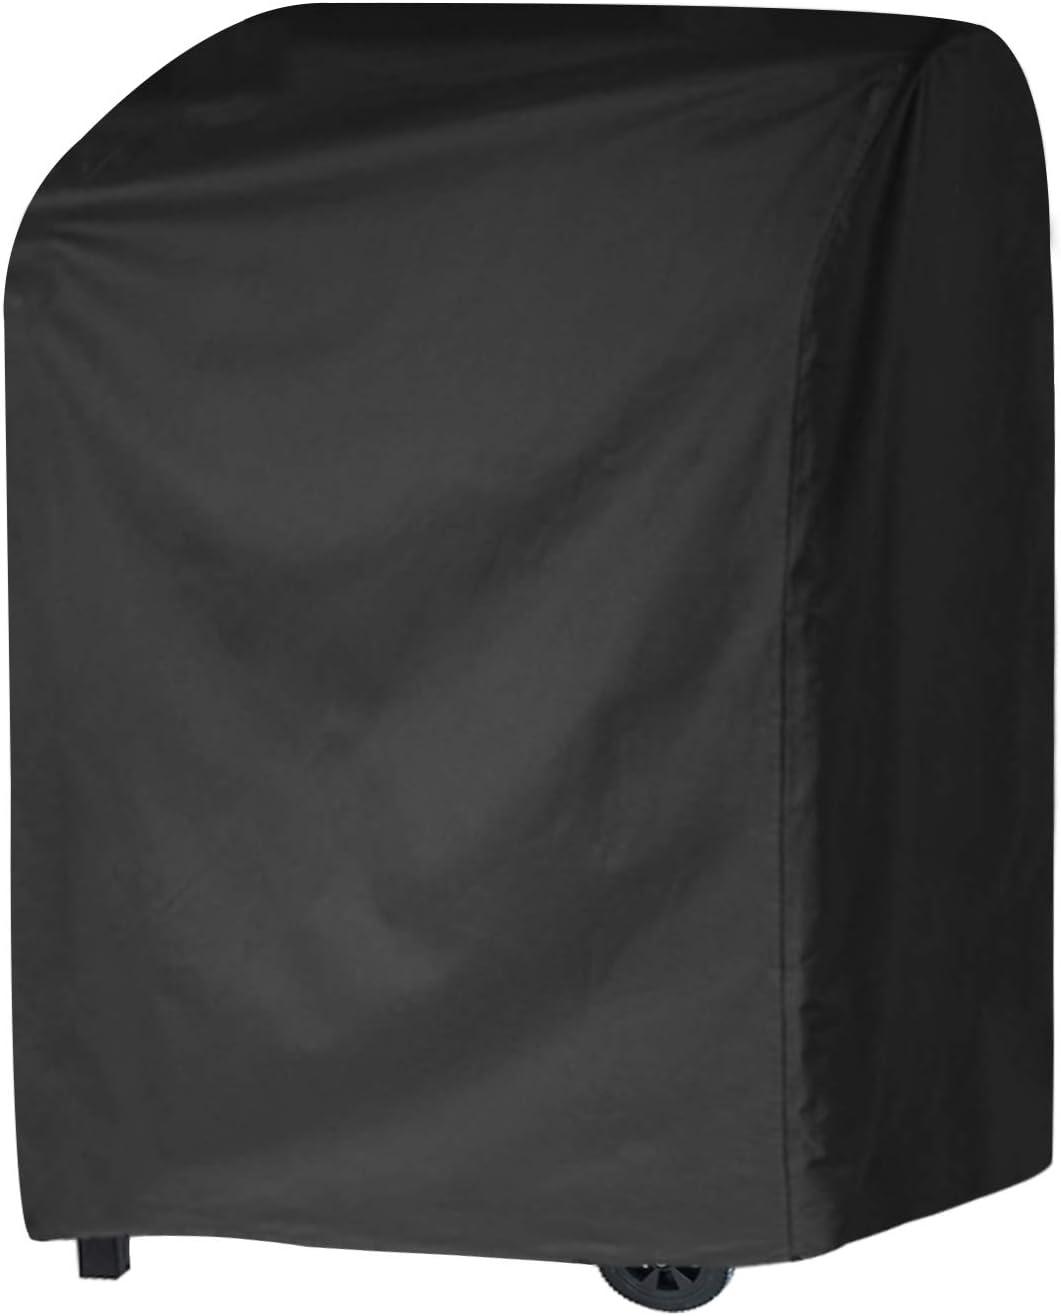 Awnic Funda Barbacoa Rectangular Funda BBQ Impermeable Tela Oxford Resistente al Desgarro 105x49x102cm